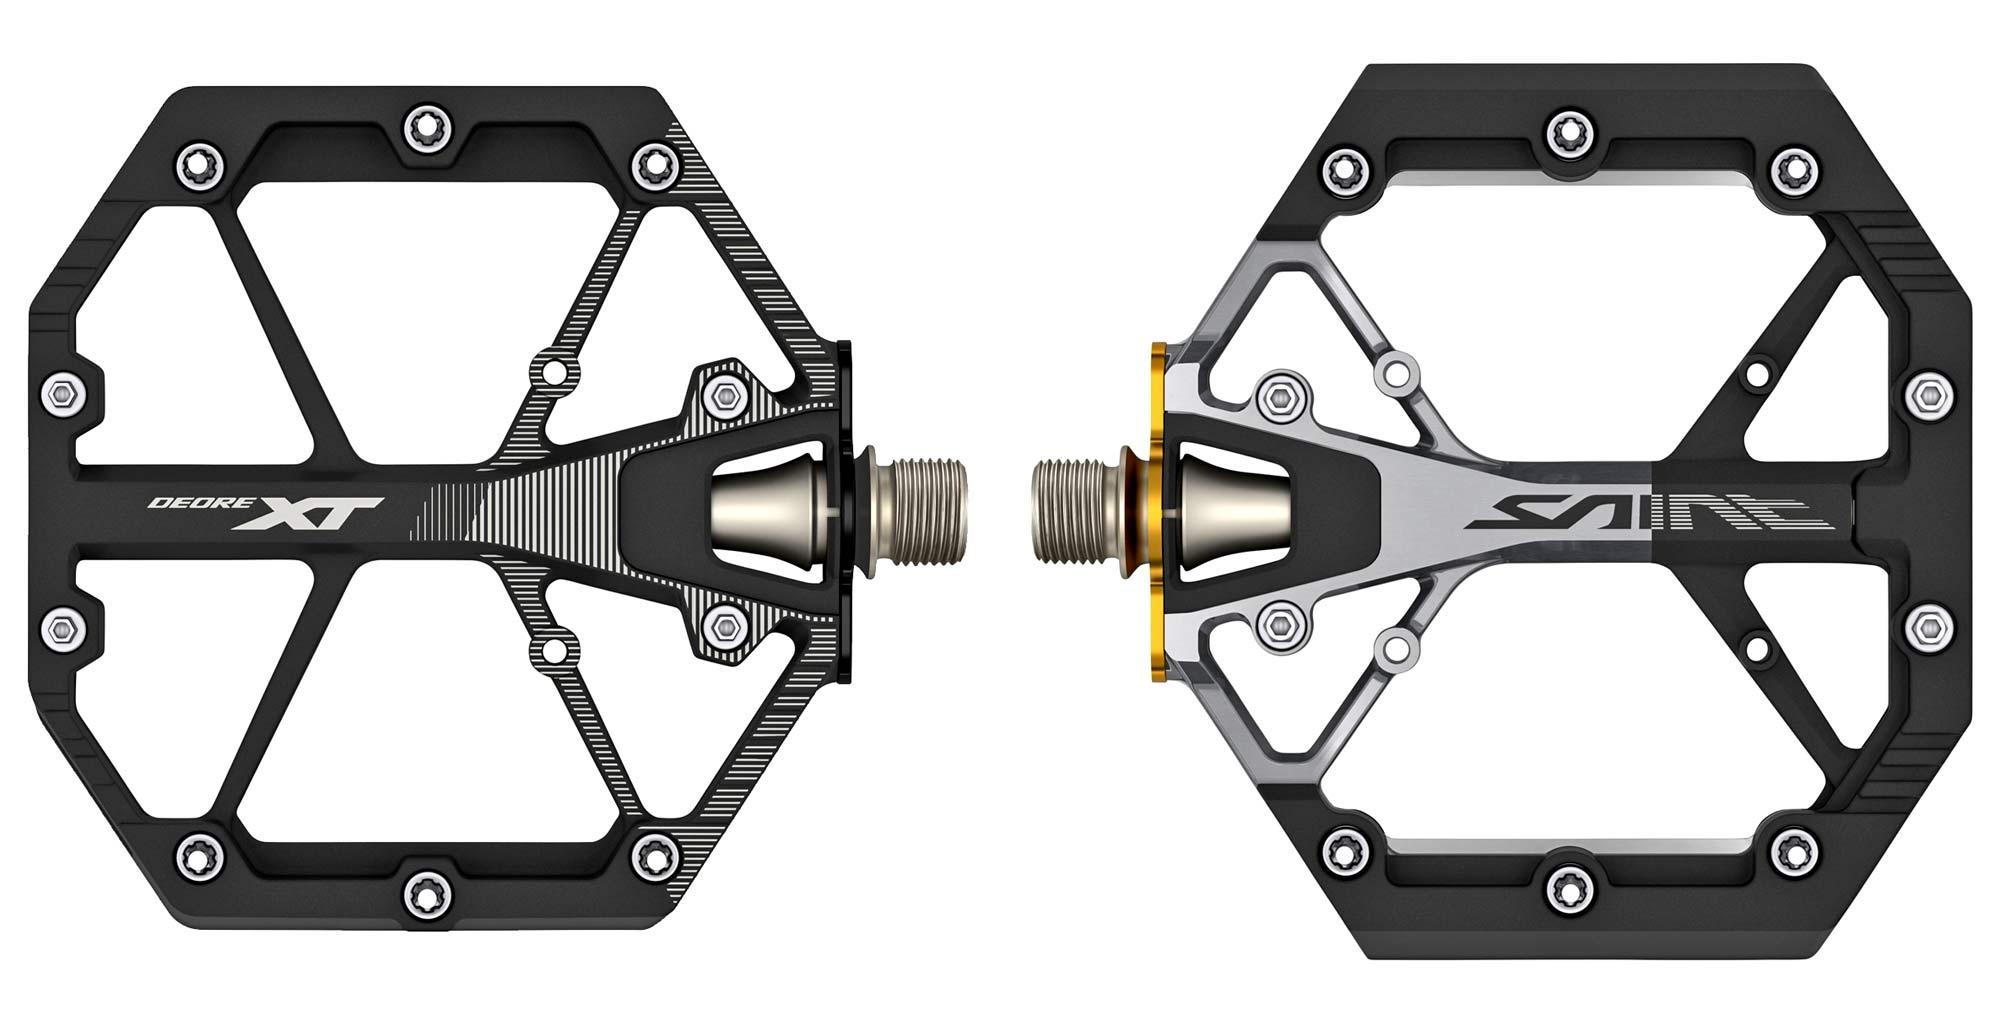 Shimano lightweight XT & Saint gravity enduro freeride DH mountain bike platform pedals, pair